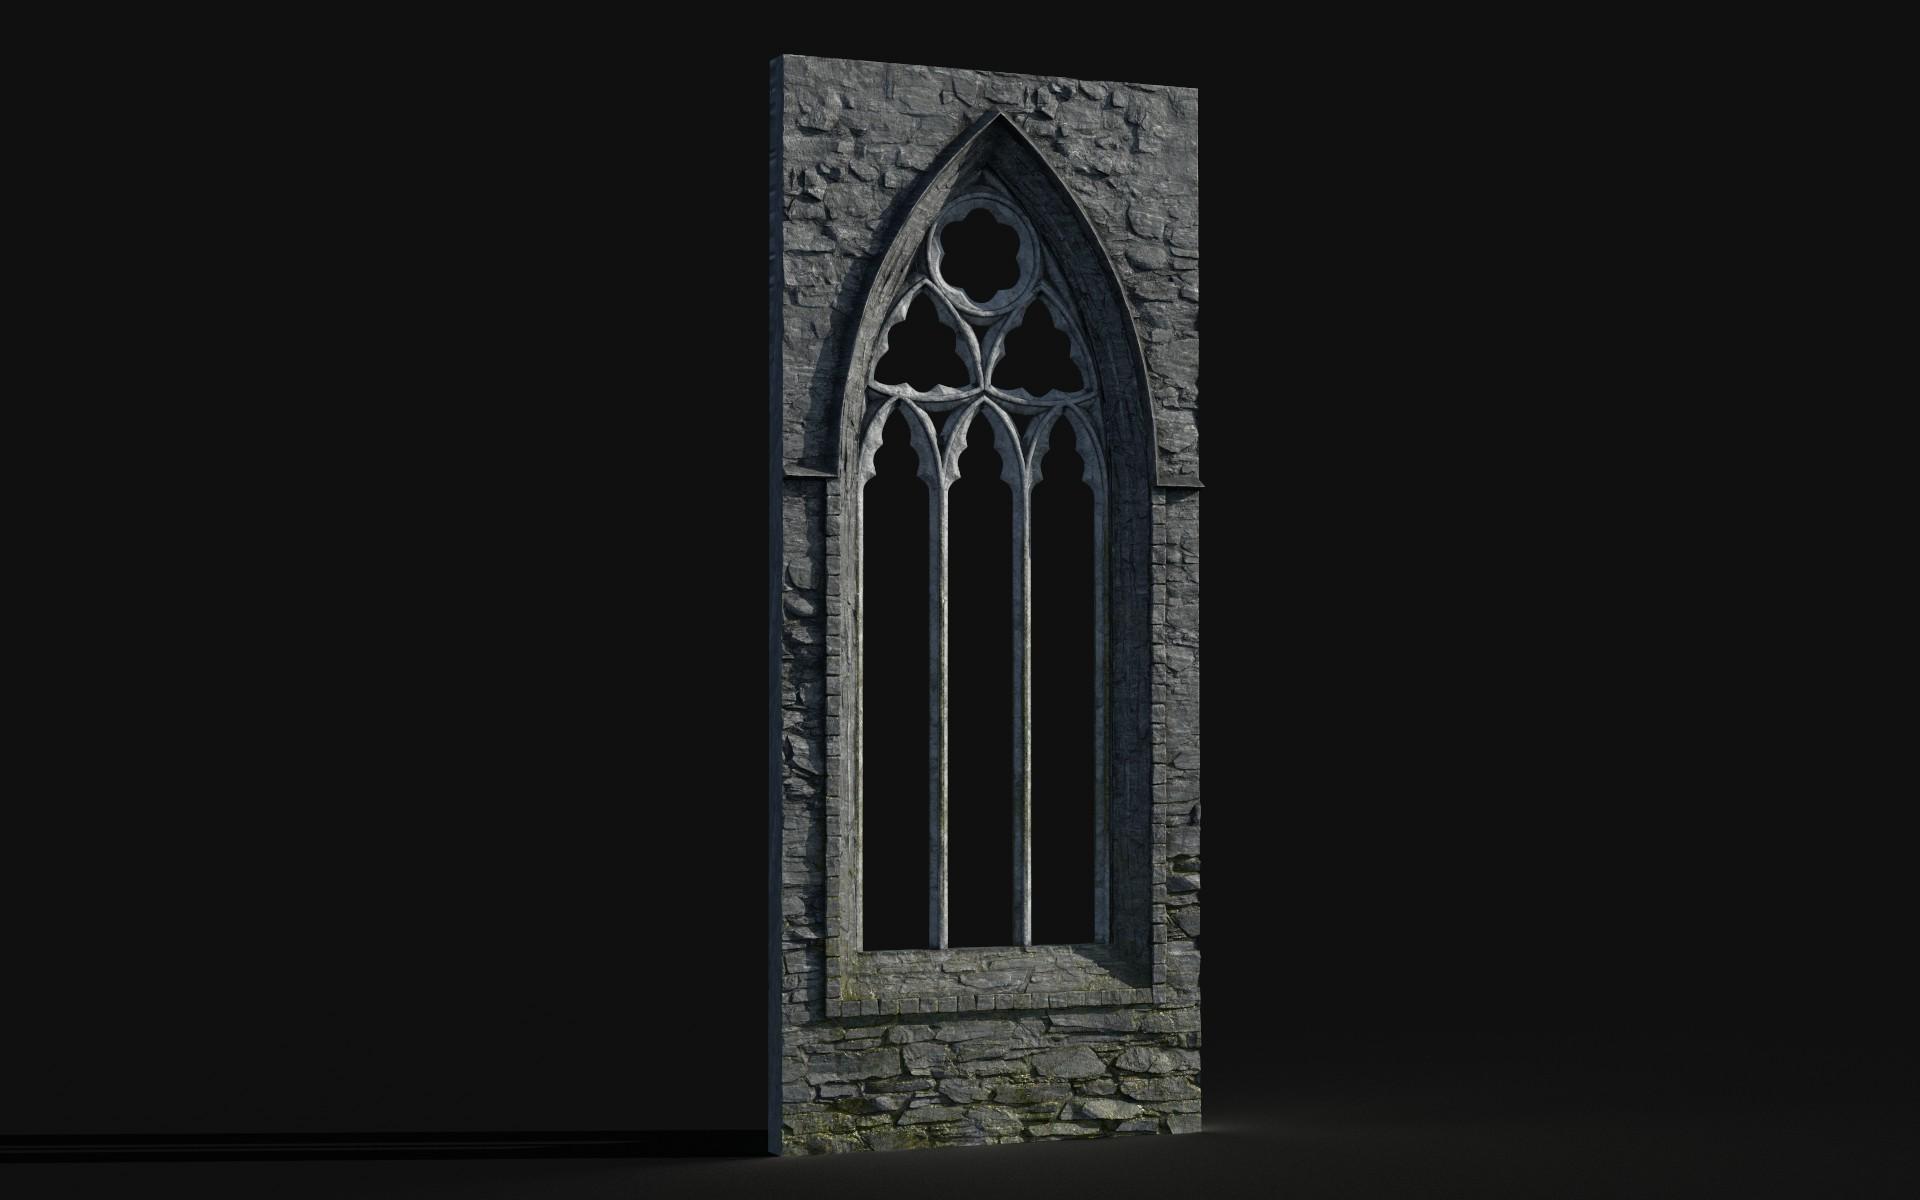 StoneCathedral_Windows_01.jpg